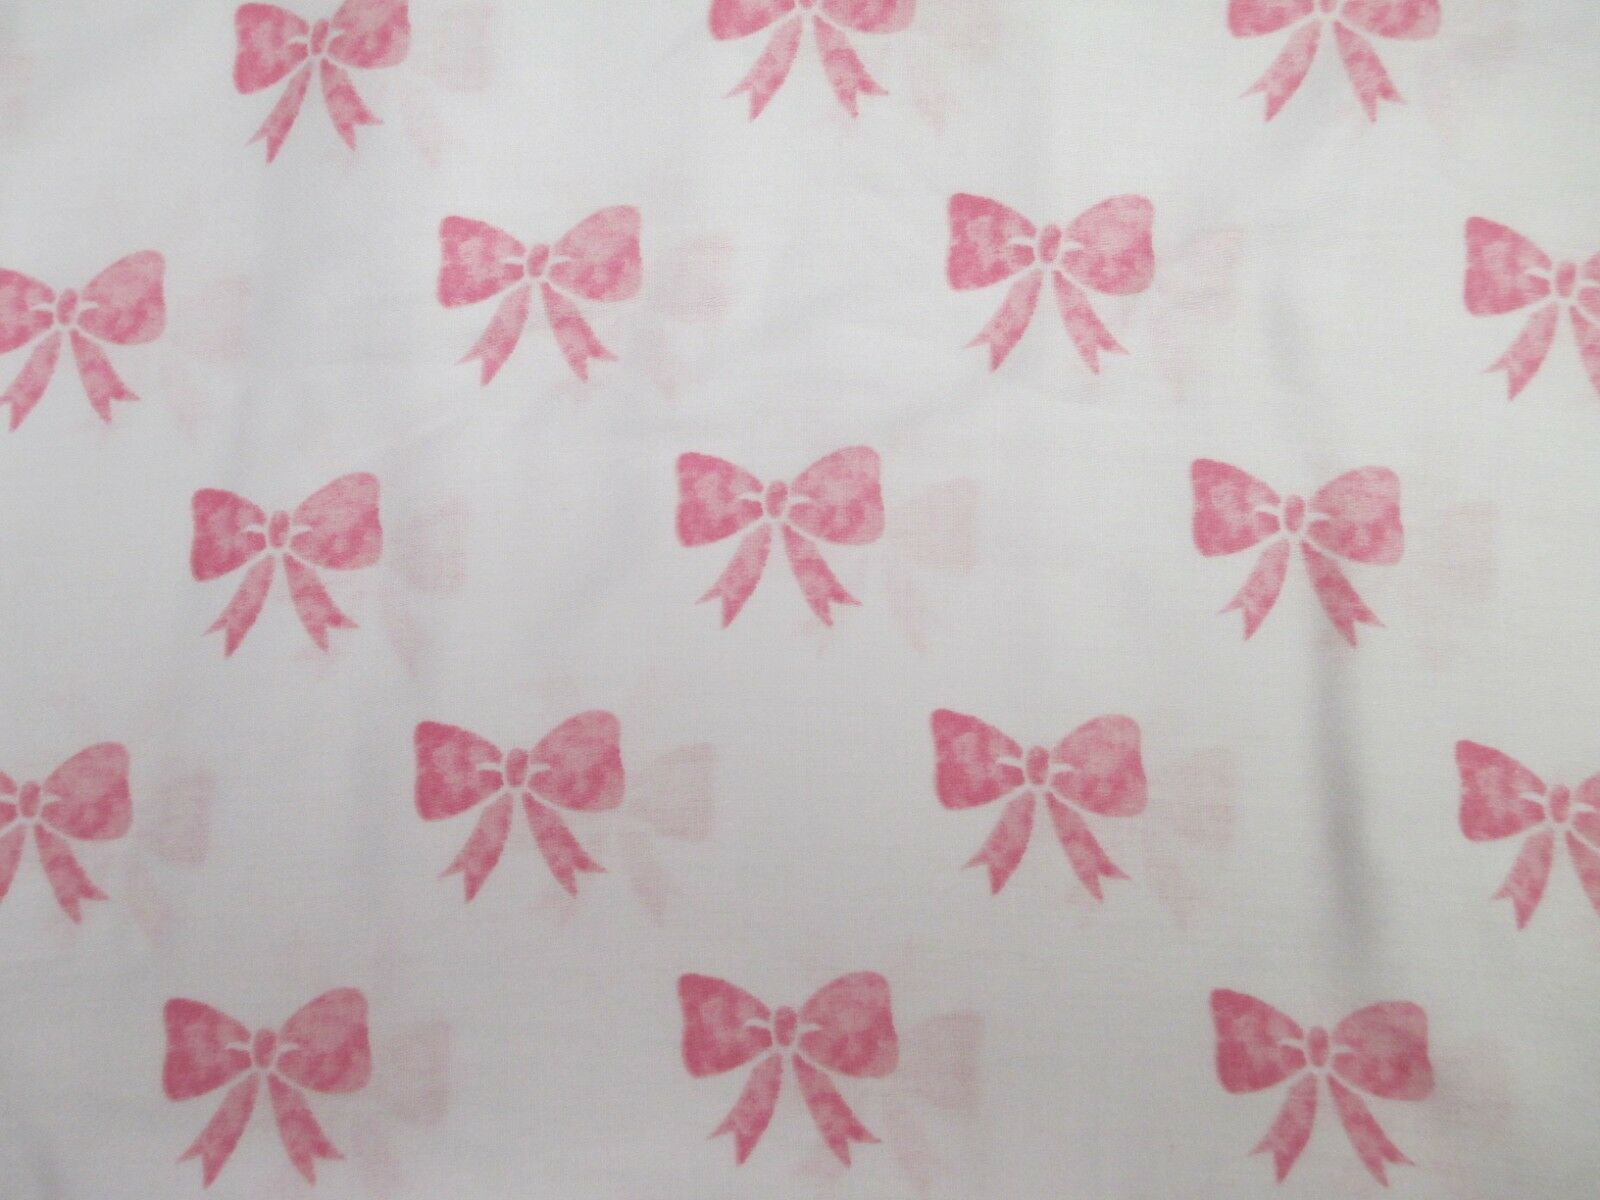 New Adorbs Kids Girls 100% Cotton White Pink Bow Sheet Set - Twin